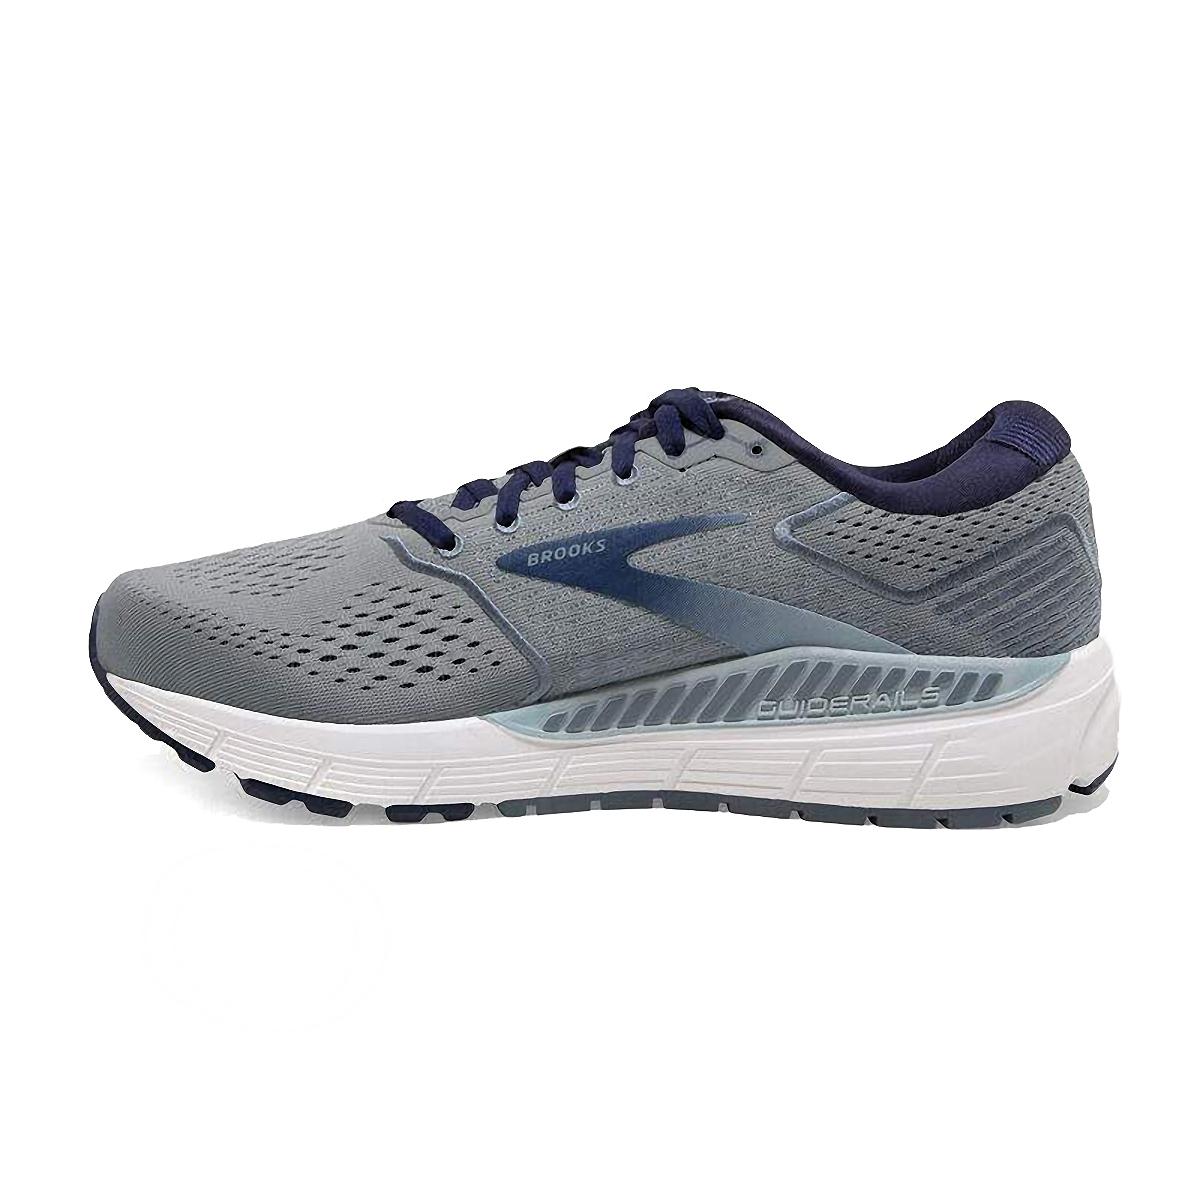 Men's Brooks Beast 20 Running Shoe - Color: Blue/Grey/Peacoat (Regular Width) - Size: 8, Blue/Grey/Peacoat, large, image 2